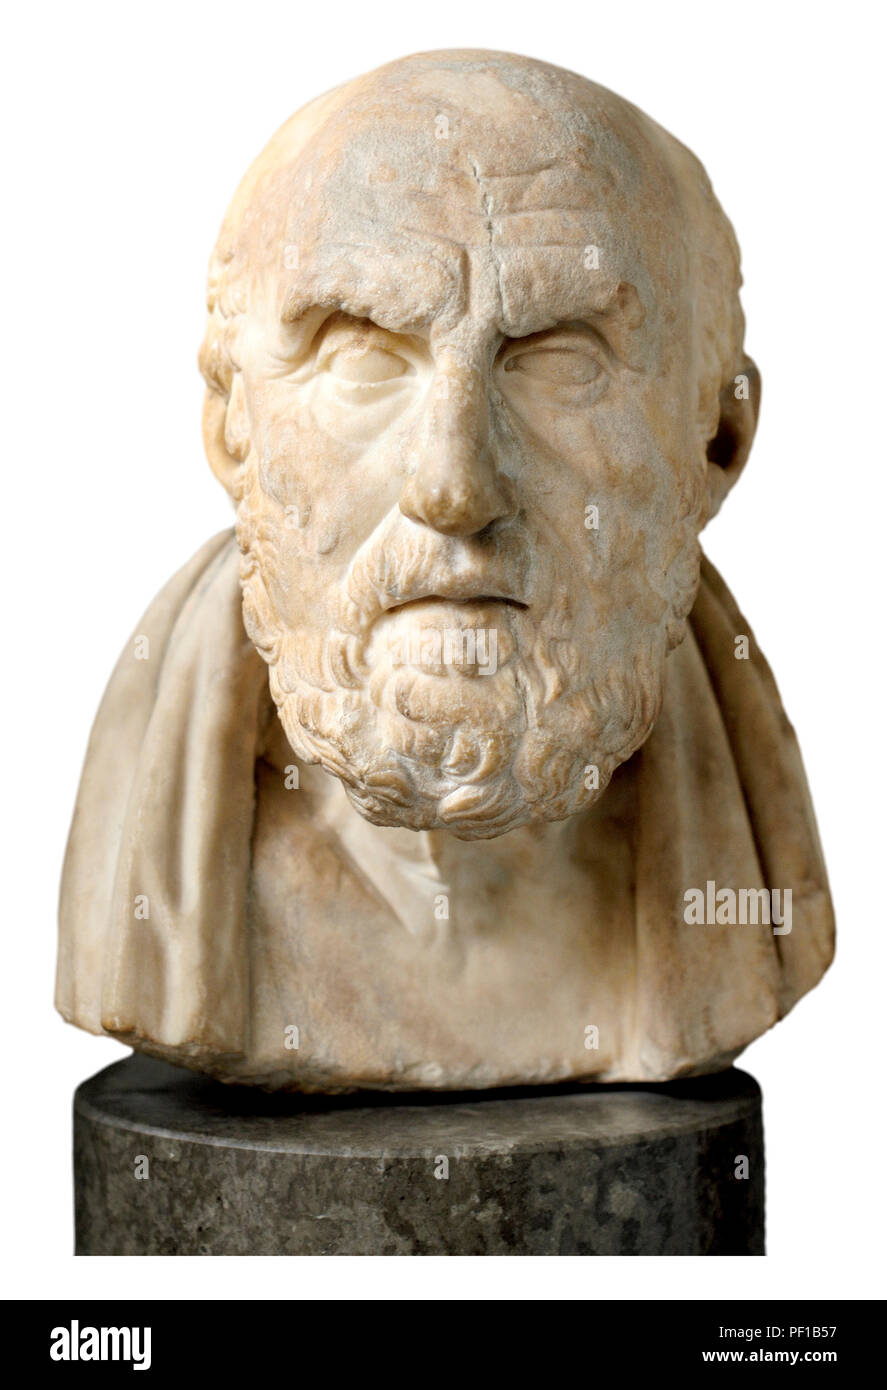 Marble bust of Chrysippos (Greek philosopher: c280-205 BC) member of the Stoic School of philosophy. British Museum, Bloomsbury, London, England, UK.  - Stock Image